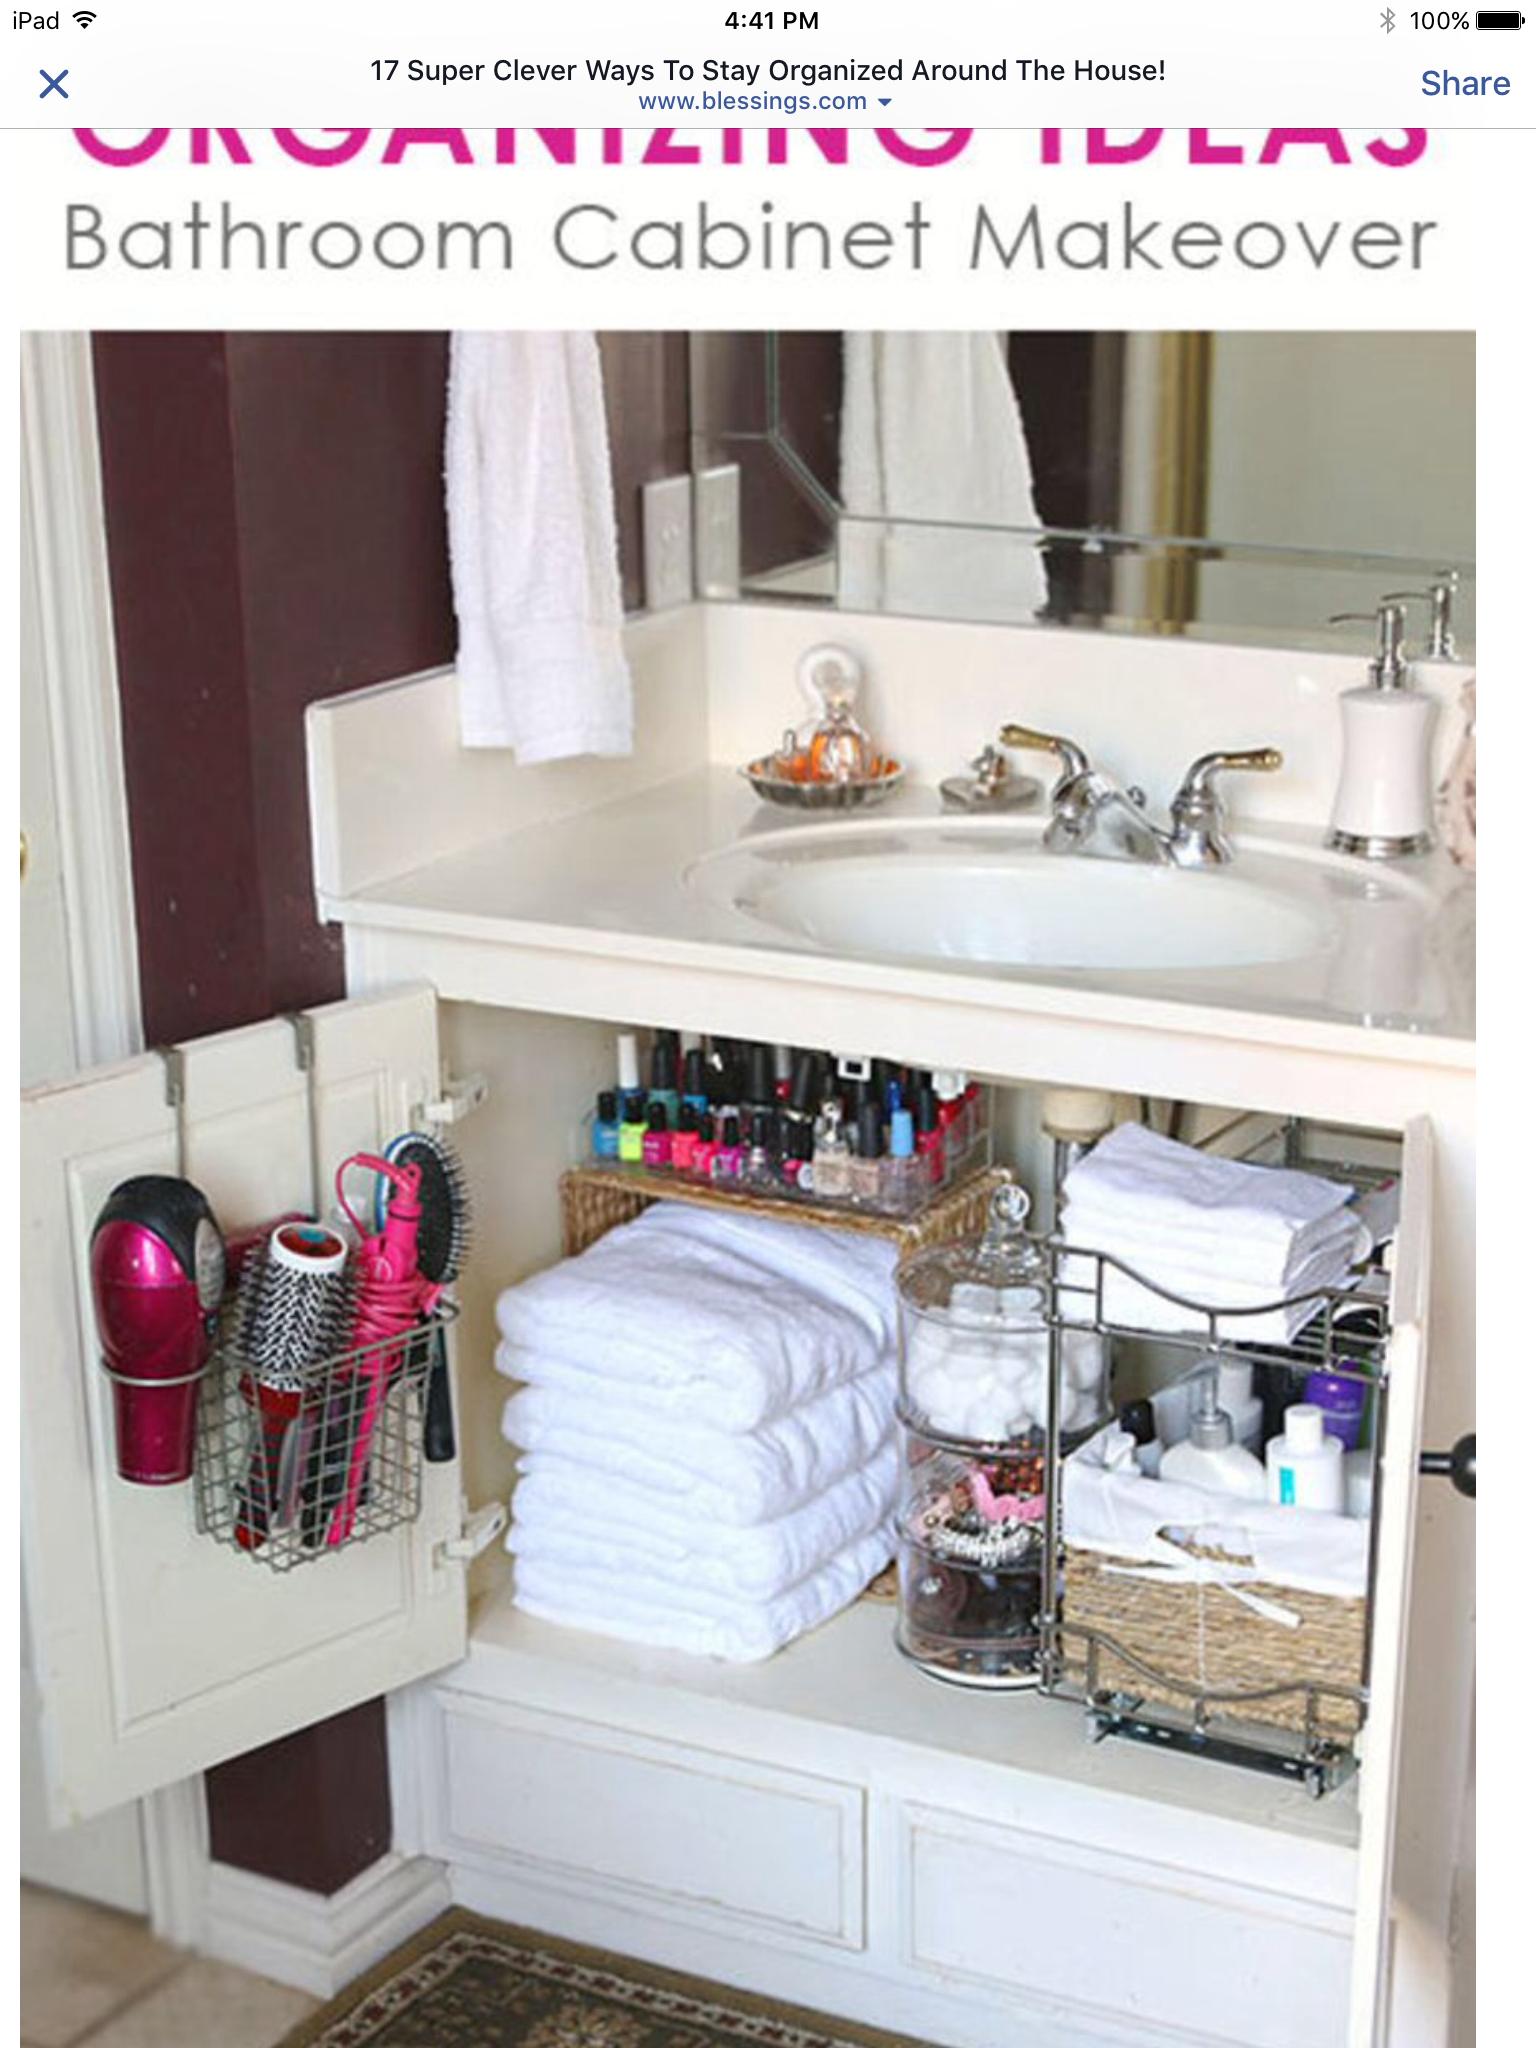 Pin by Tina Hurston on Organization bathroom | Pinterest ...